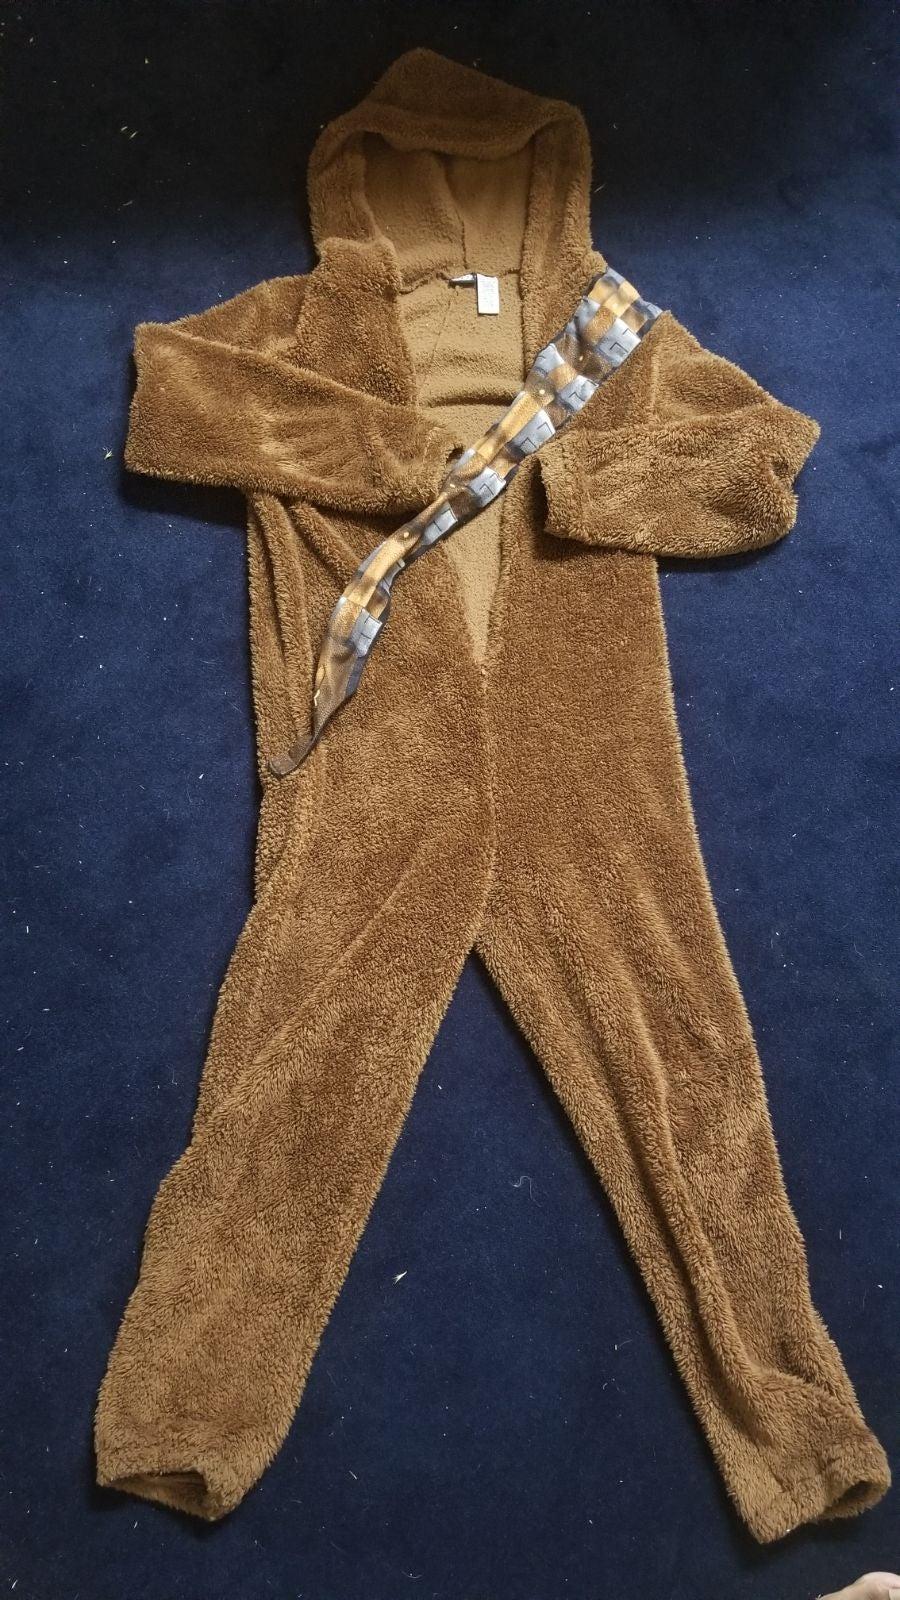 Star Wars Chewbacca costume Small